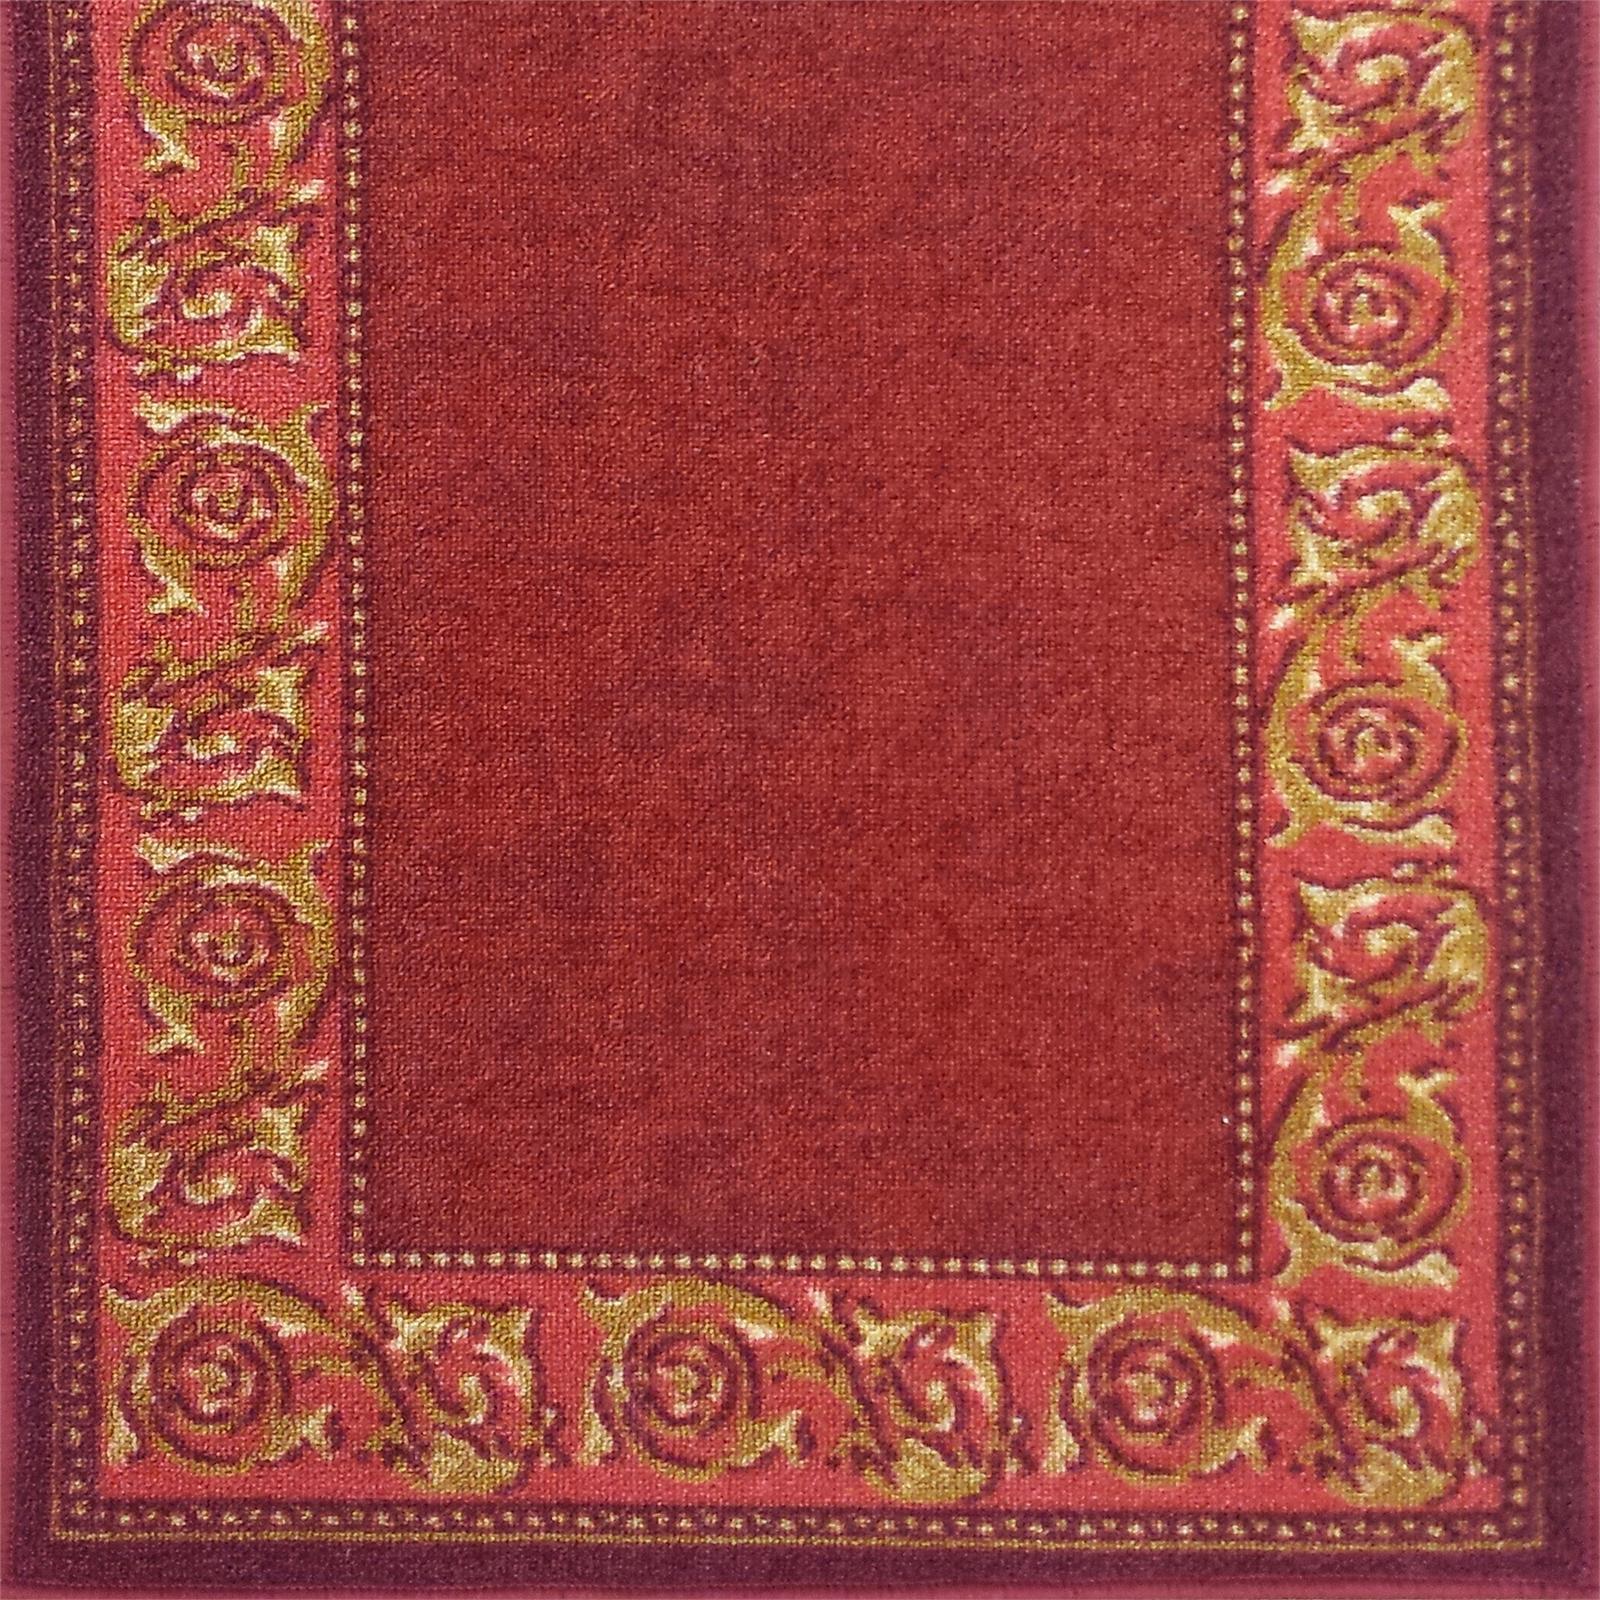 Ideal DIY 67 x 294cm Gold Leaf Red Loop Pile Carpet Runner